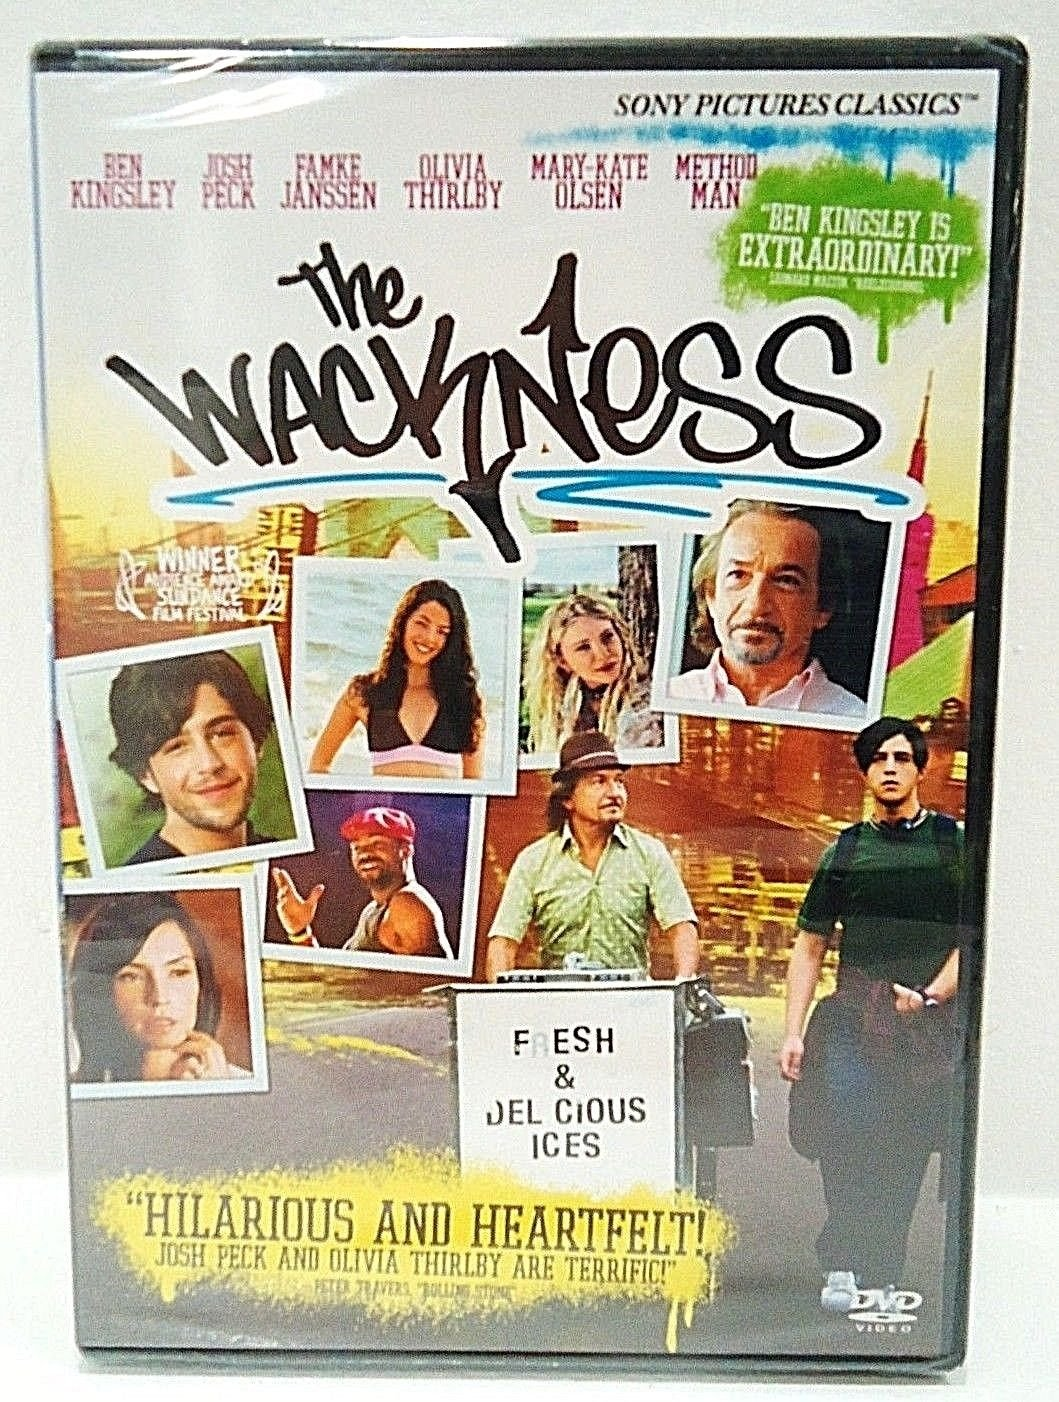 THE WACKNESS - DVD - BEN KINGSLEY - JOSH PECK - NEW - SEALED - COMEDY - MOVIE